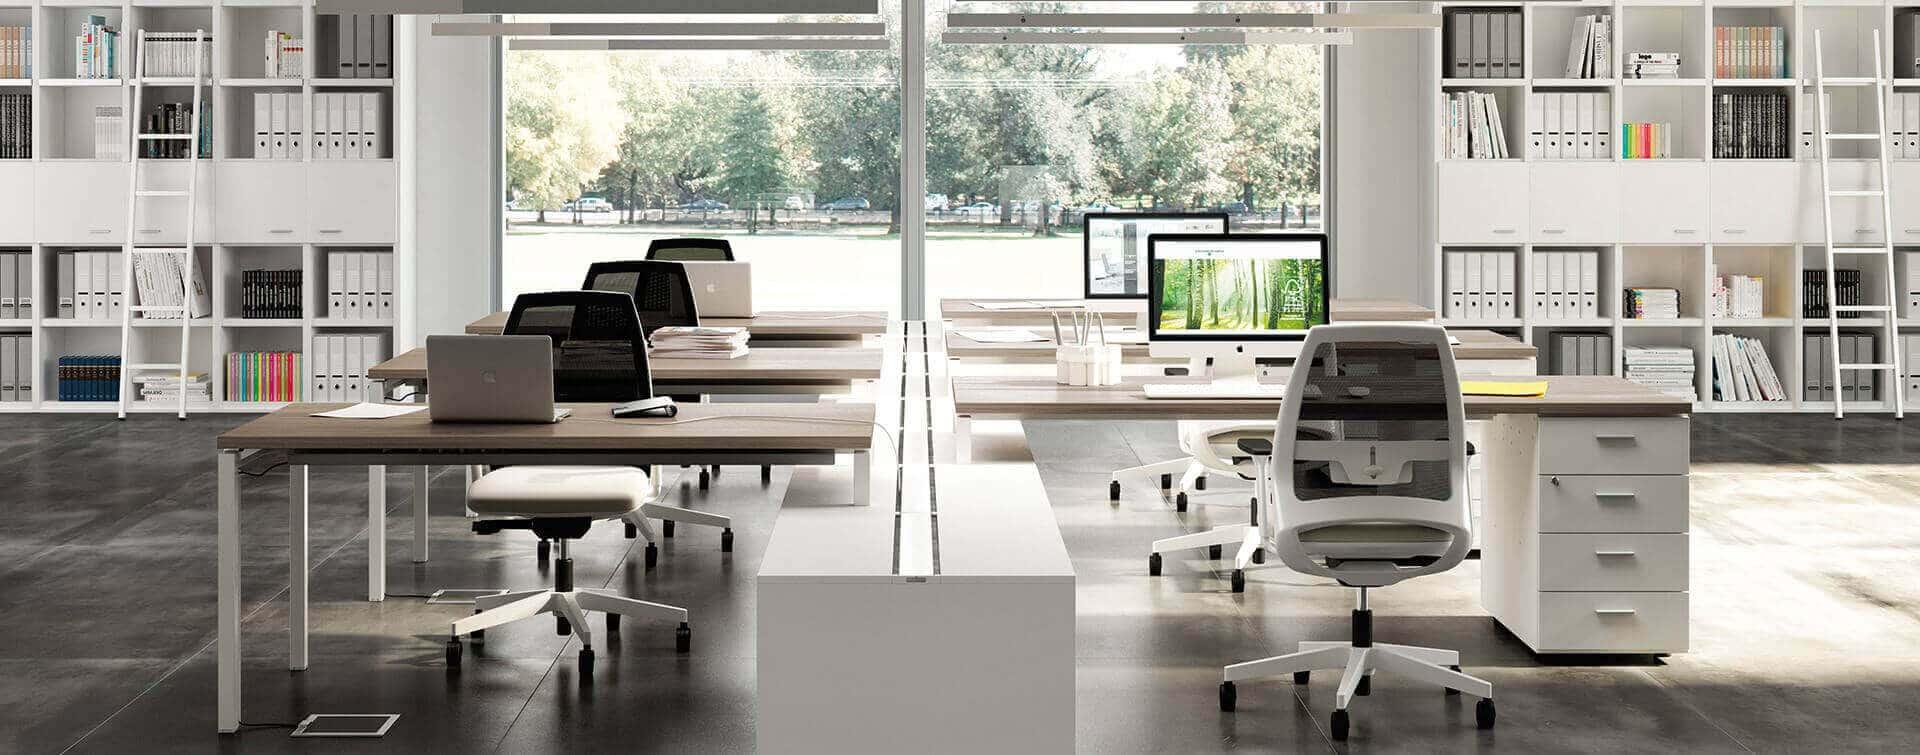 Ambientes de oficinas dinámicas